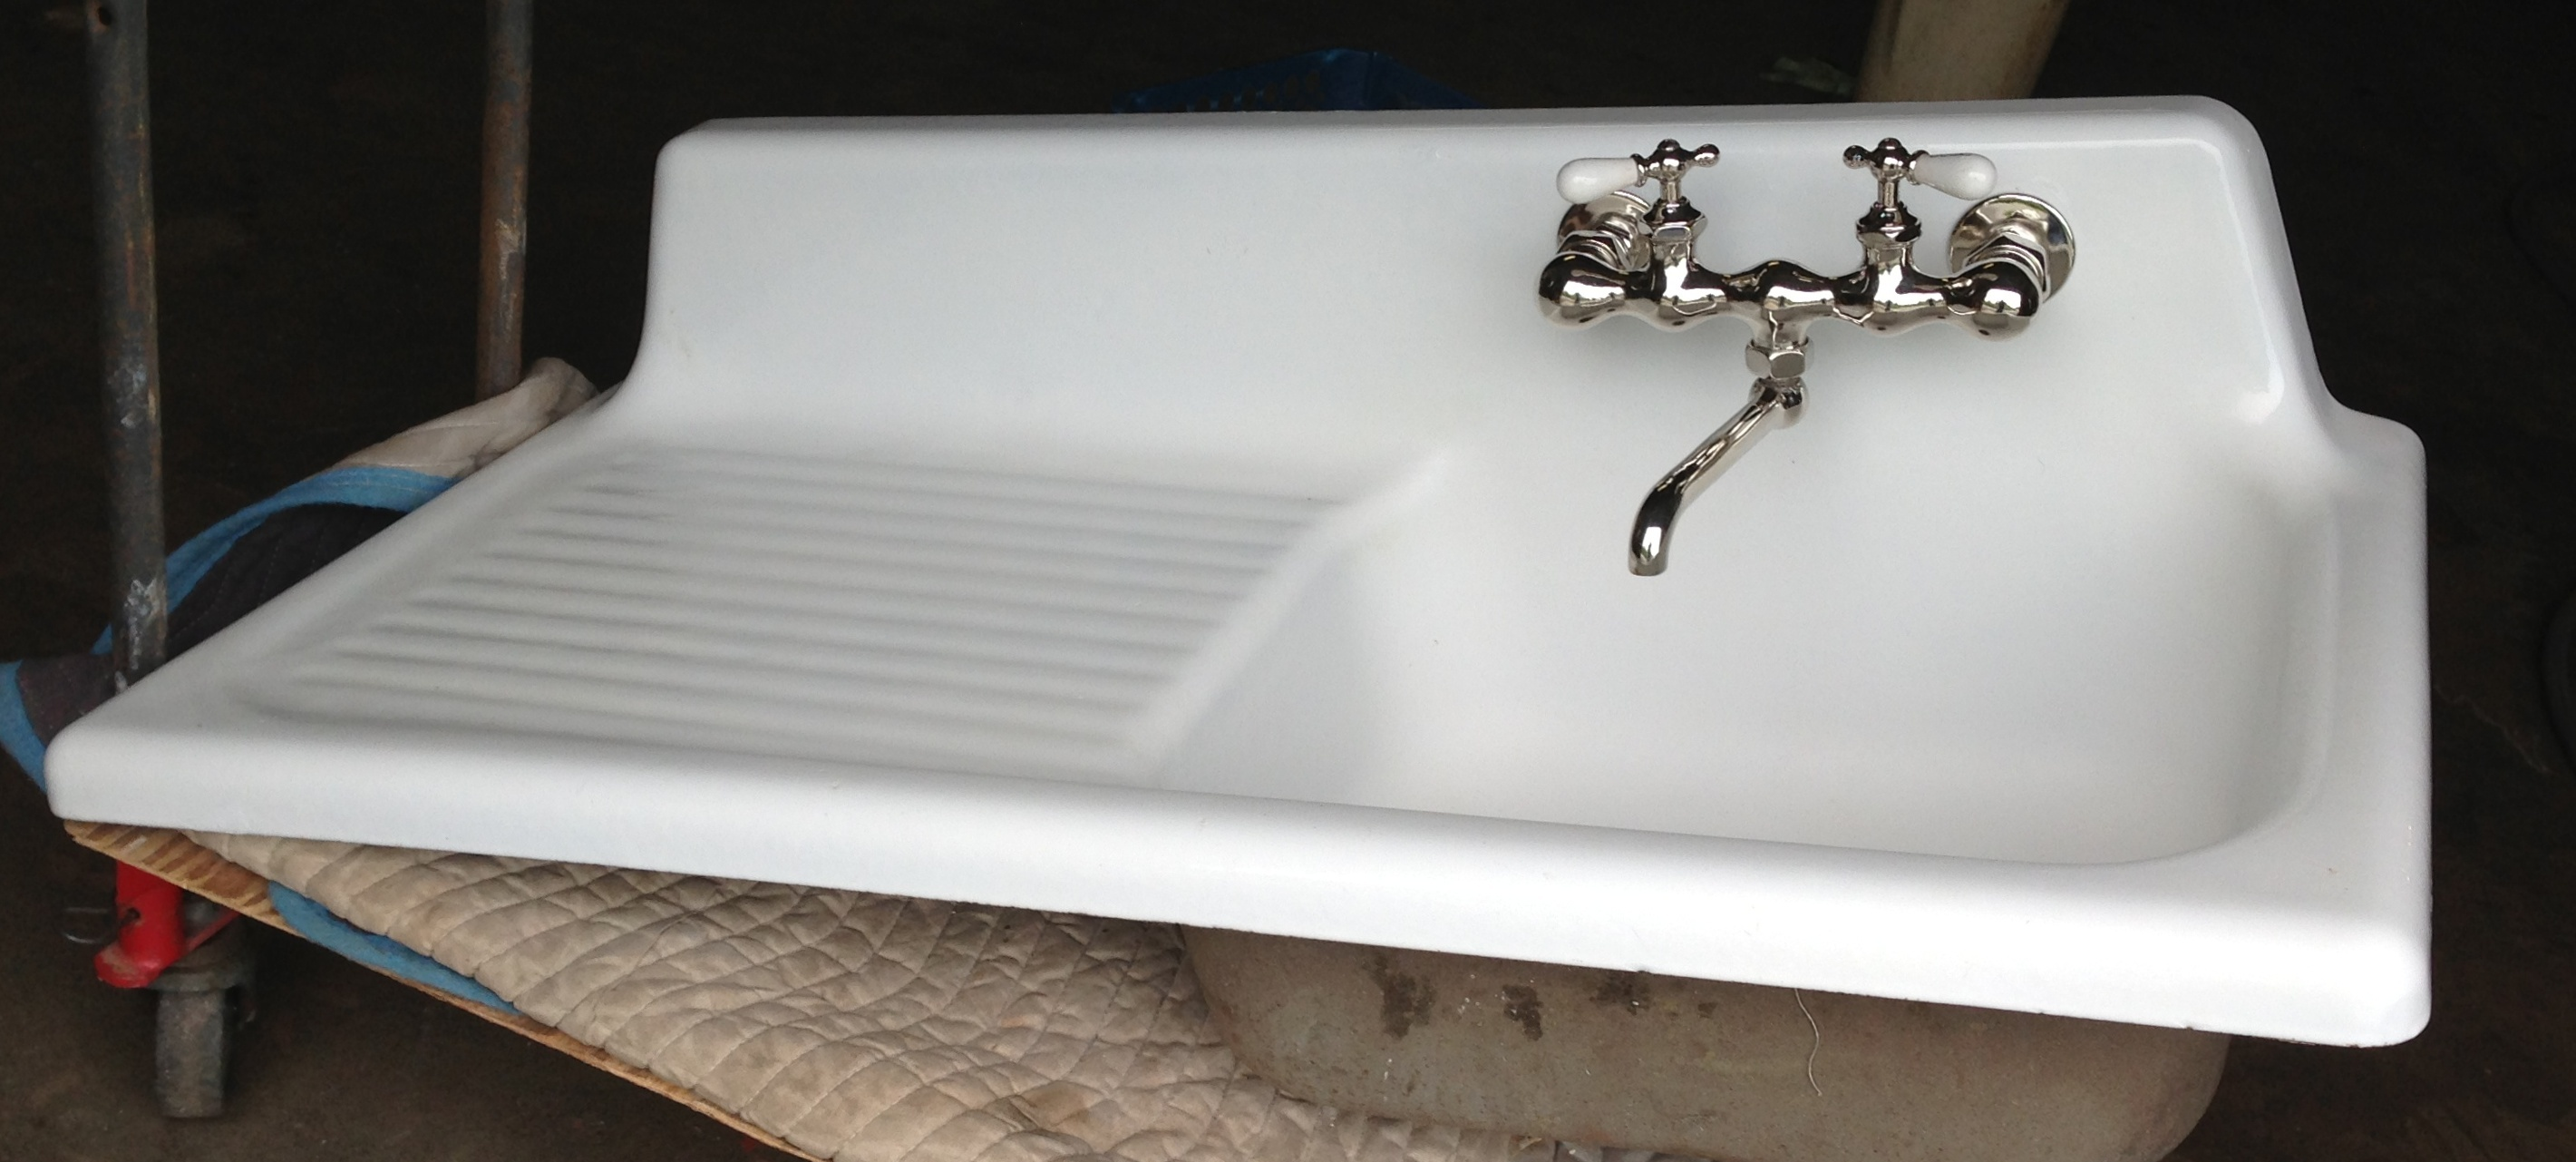 kitchen kohler kitchen sinks Kohler 42 20 Roll Rim Enameled Cast Iron Sink 8 deep basin 00